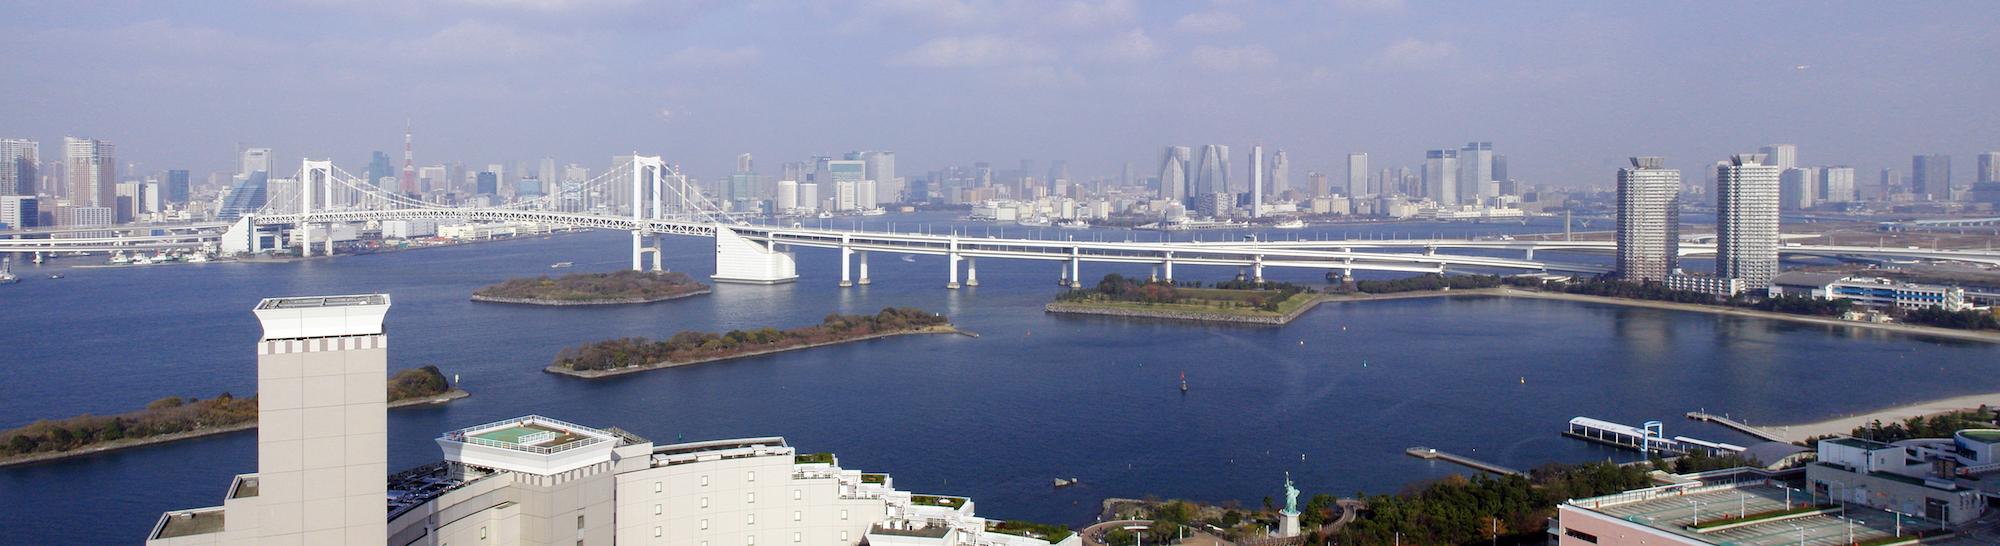 Rainbow_BridgeTokyo_Bay_from_Odaiba1